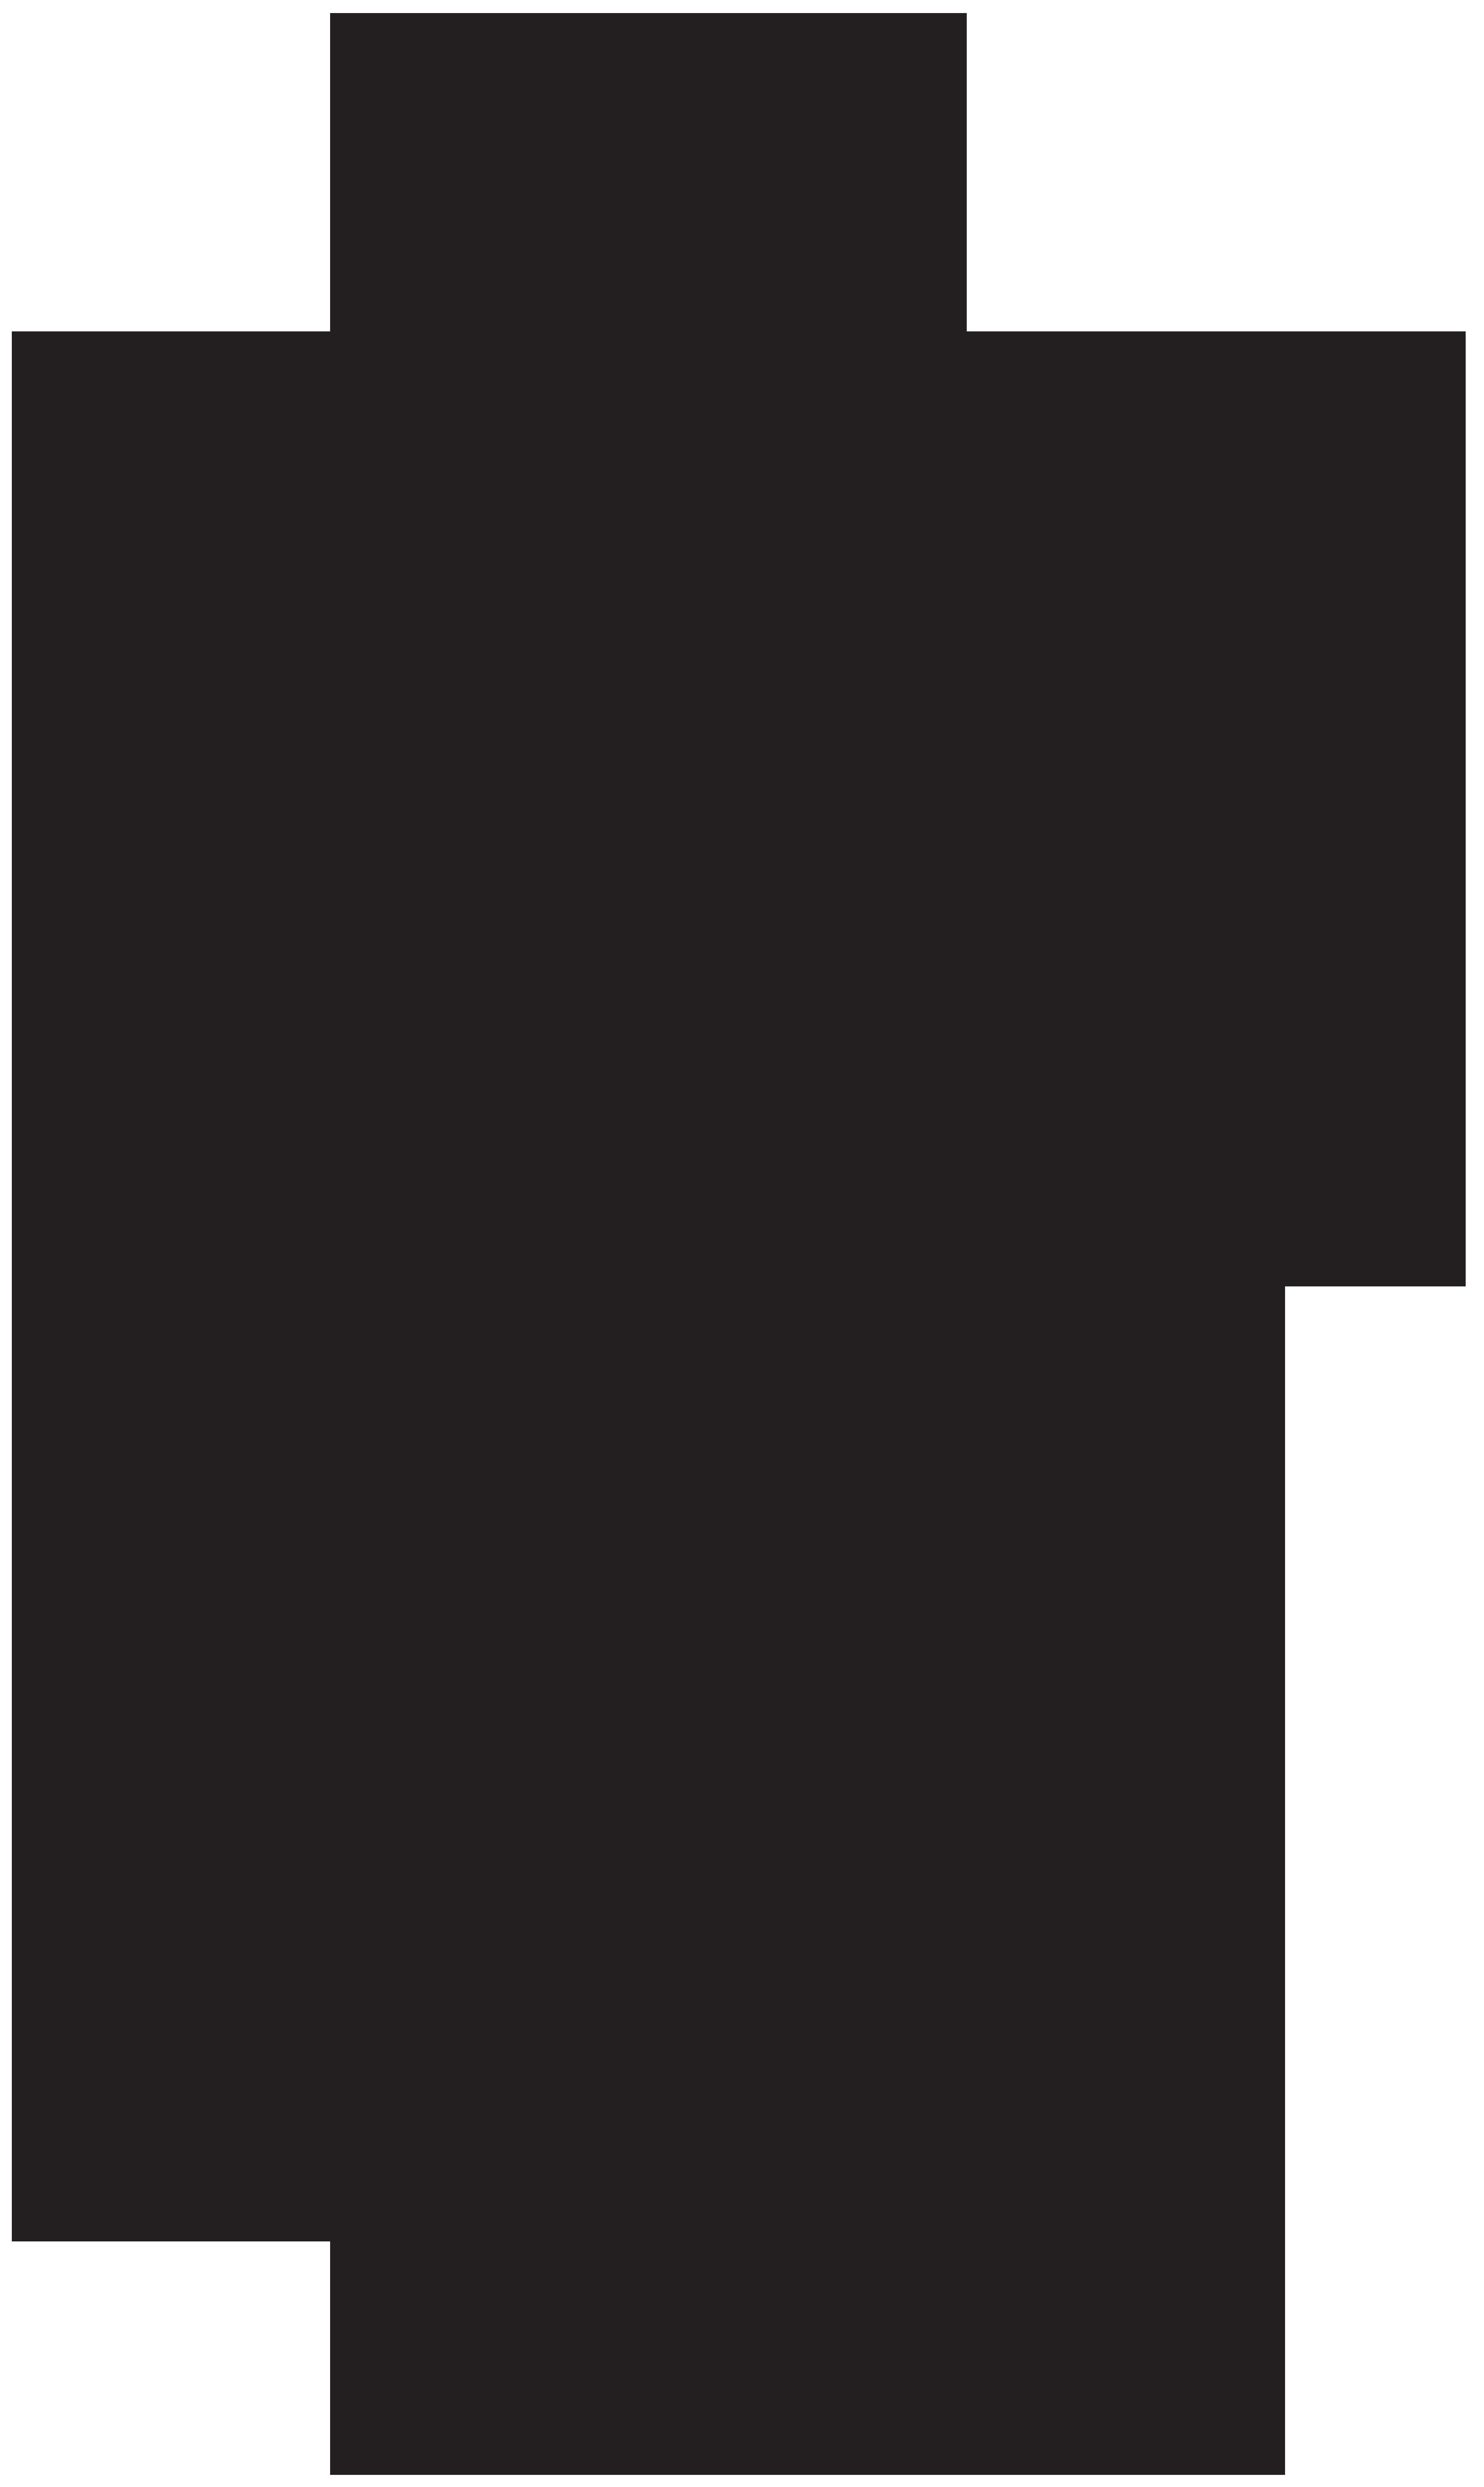 4774x8000 Basketball Player Silhouette Png Clip Art Imageu200b Gallery